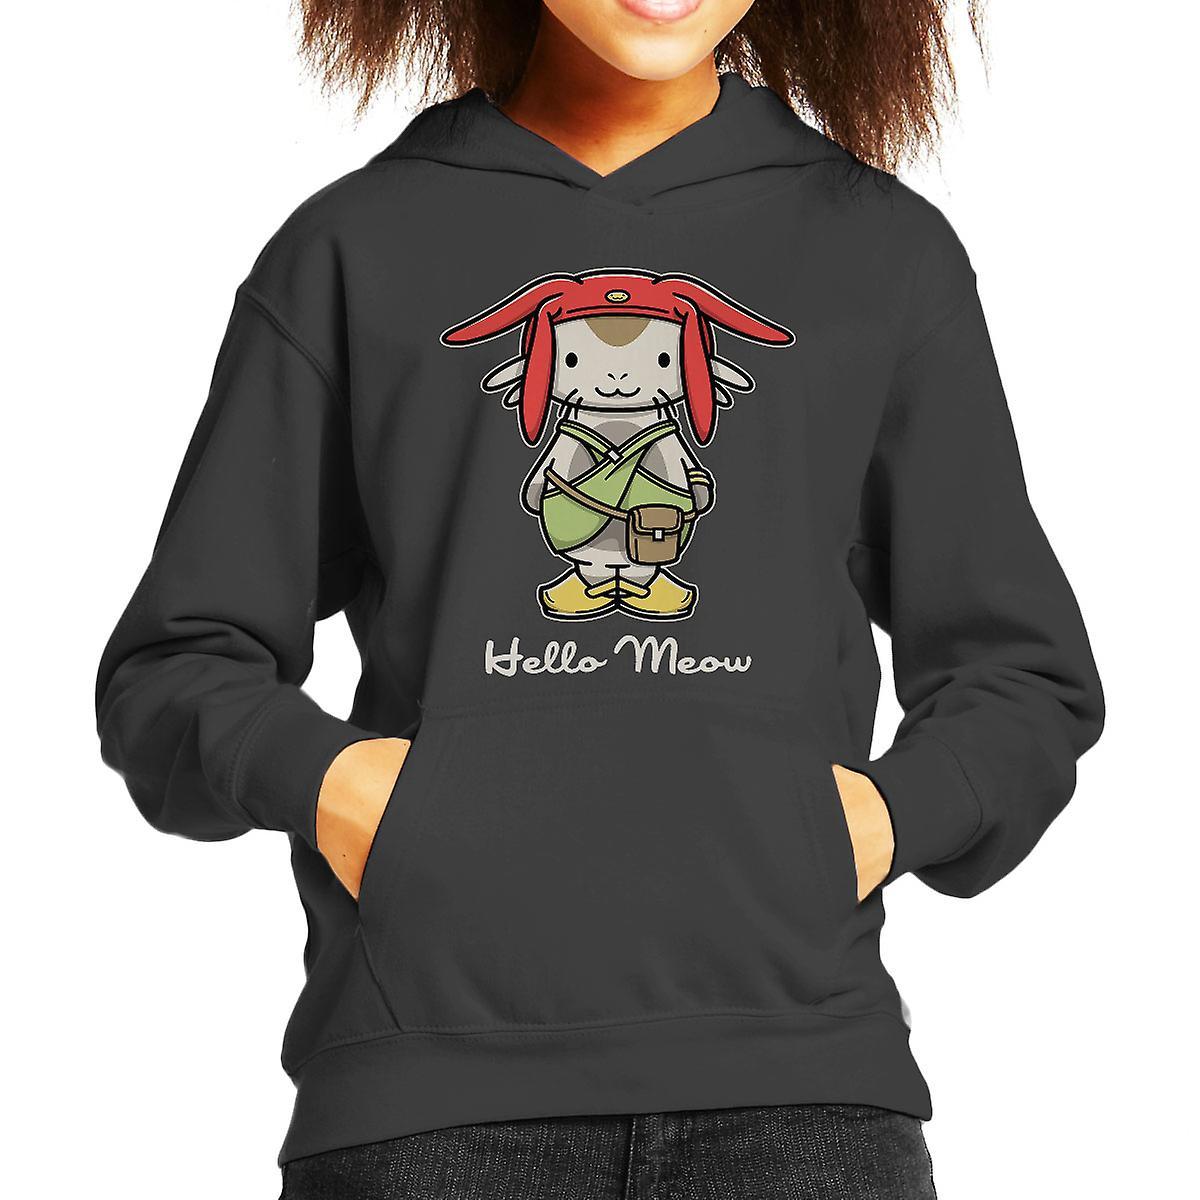 Hello Meow Space Dandy Kitty Kid's Hooded Sweatshirt